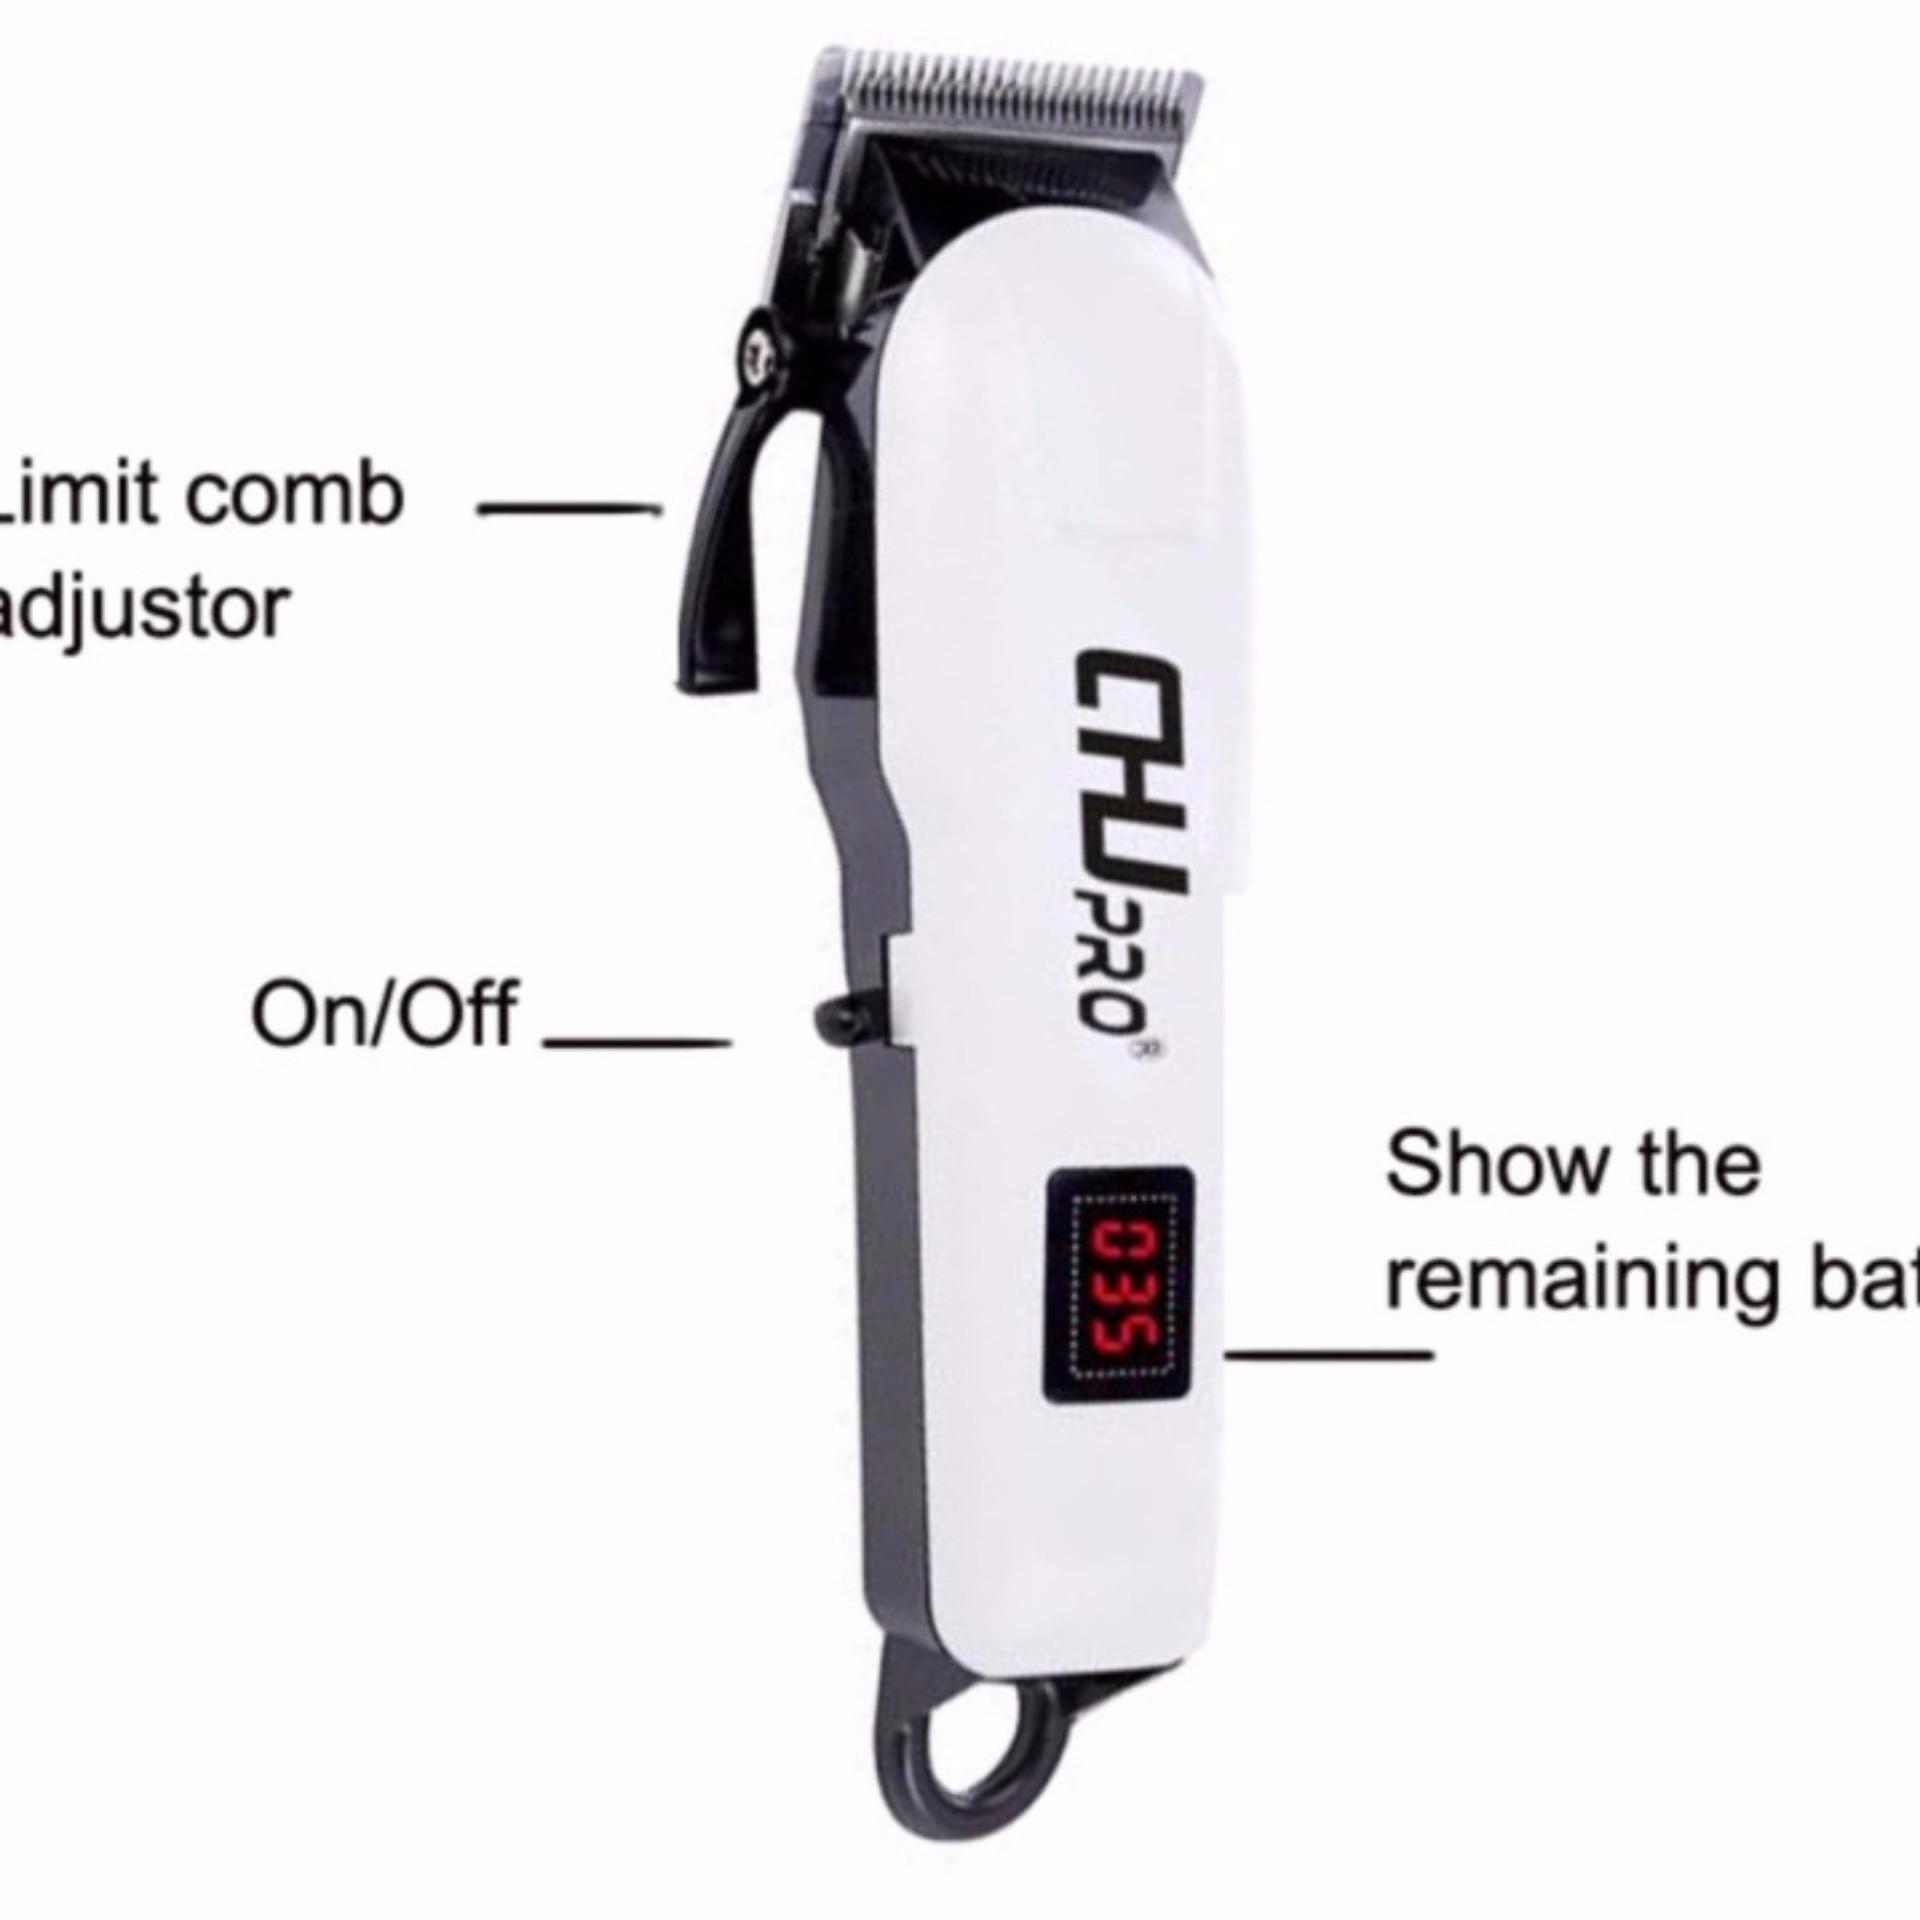 Review Toko Hair Clipper Superior Taper Rfcd Chj Pro 908 Mesin Cukur Rambut Cordless